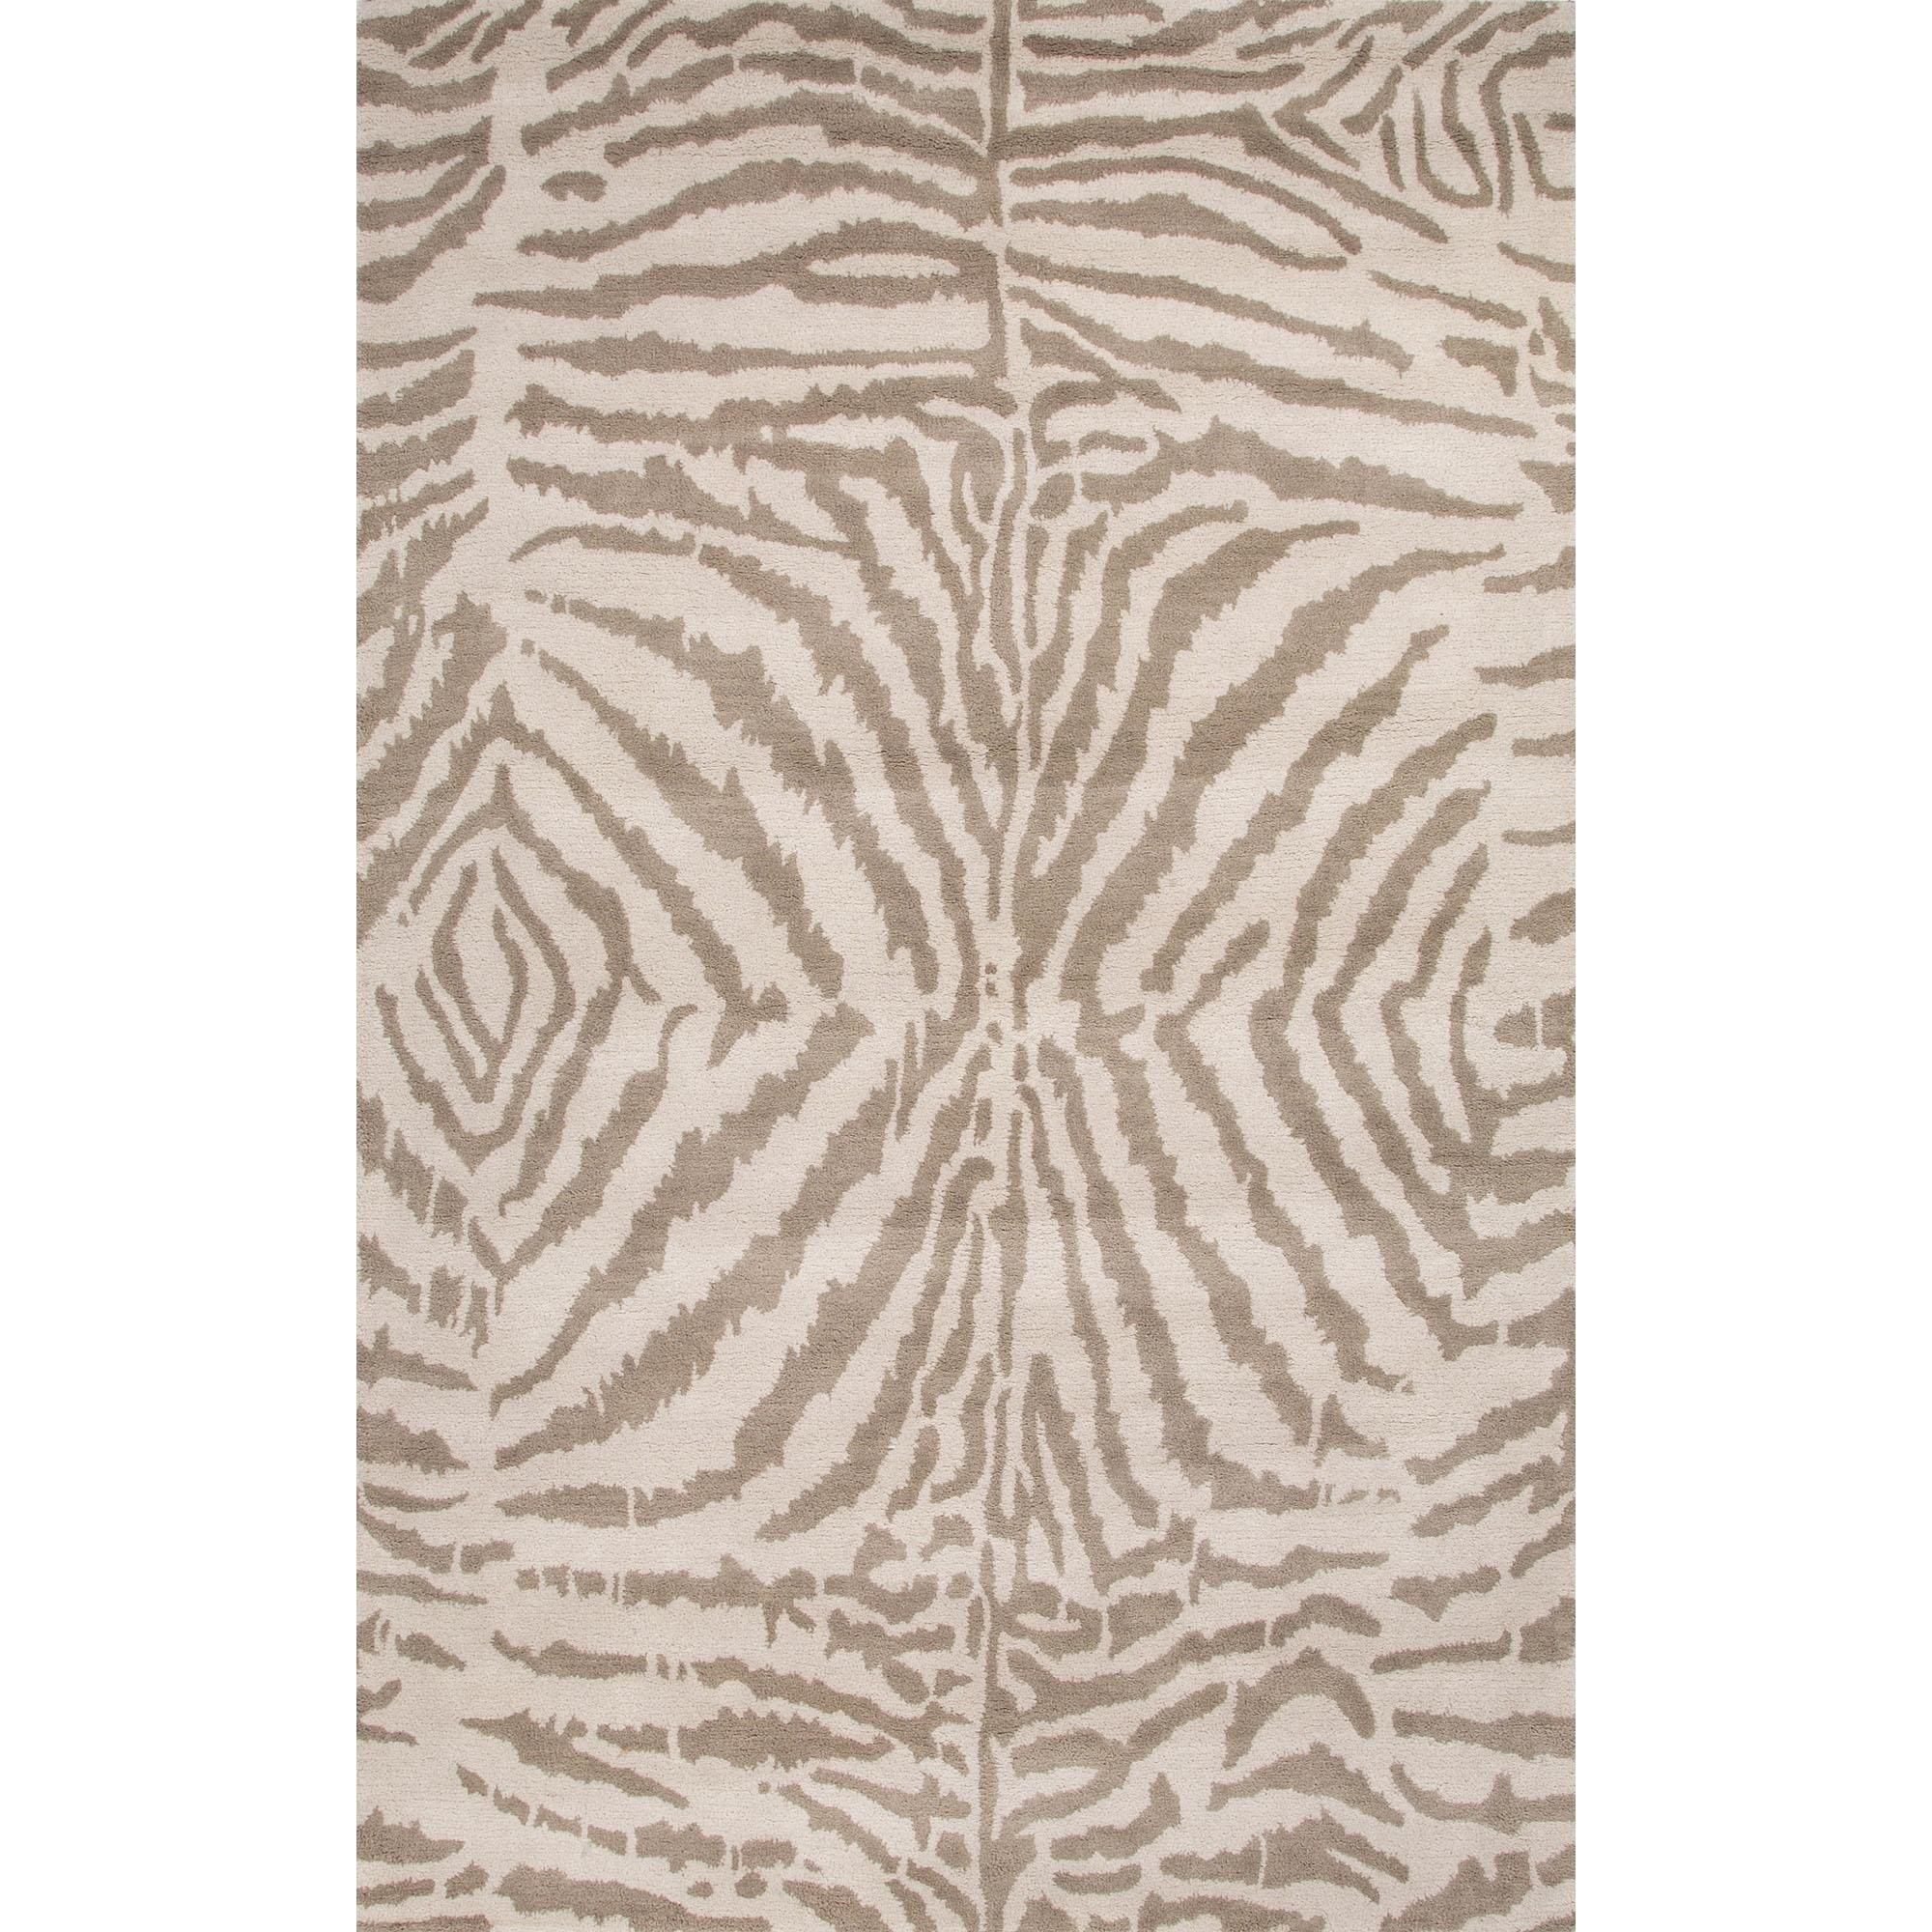 JAIPUR Rugs En Casa By Luli Sanchez Tufted 8 x 11 Rug - Item Number: RUG118117